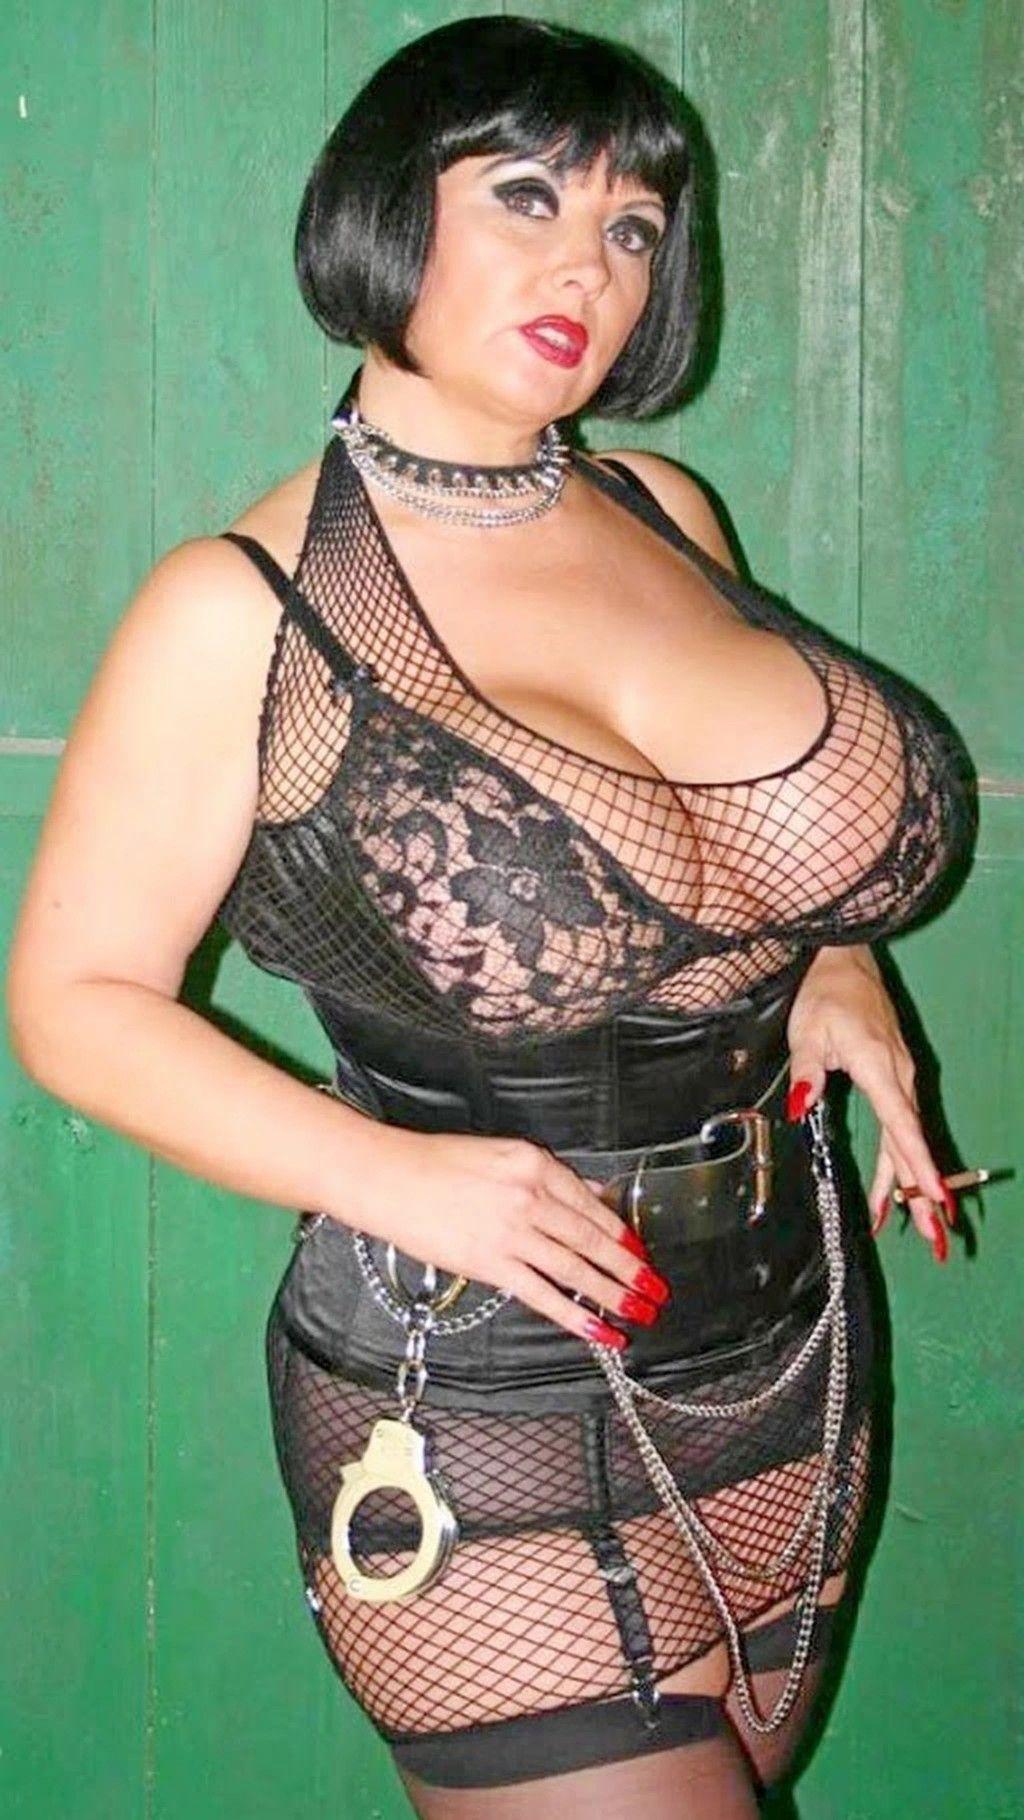 best of Smoking woman Busty